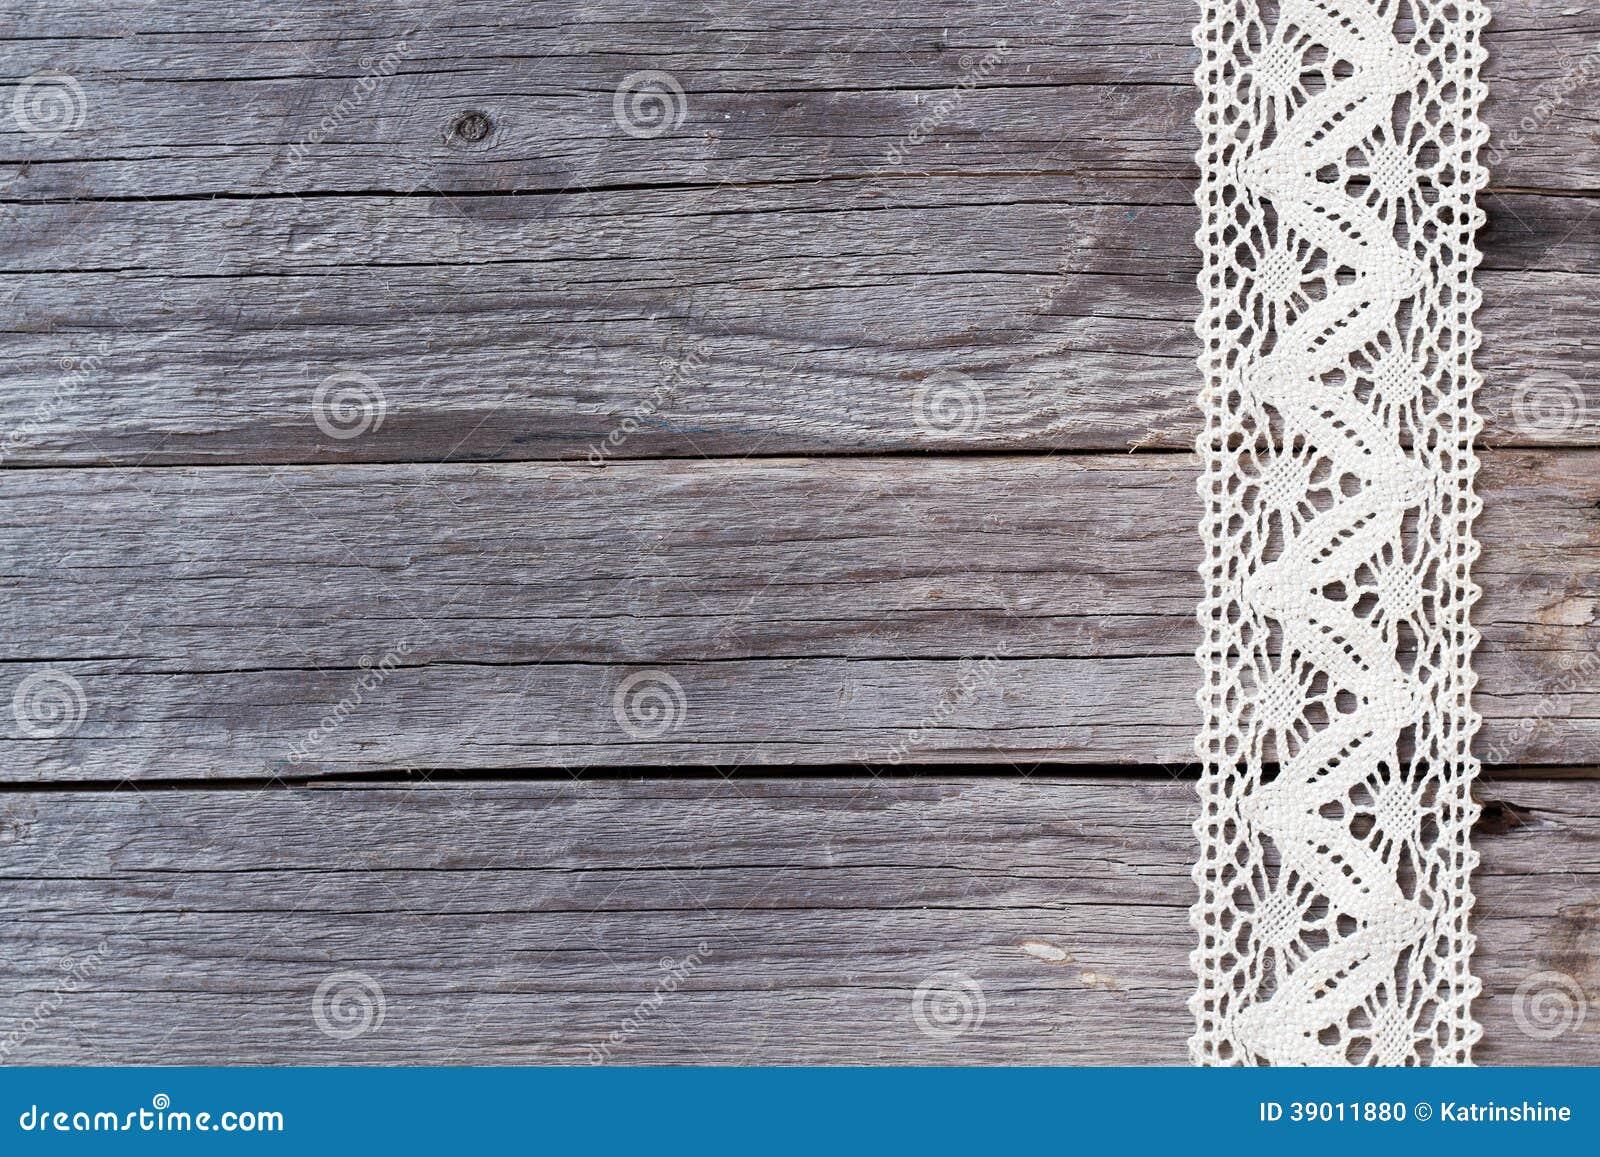 Lace On Old Wood Background Stock Photo Image Of